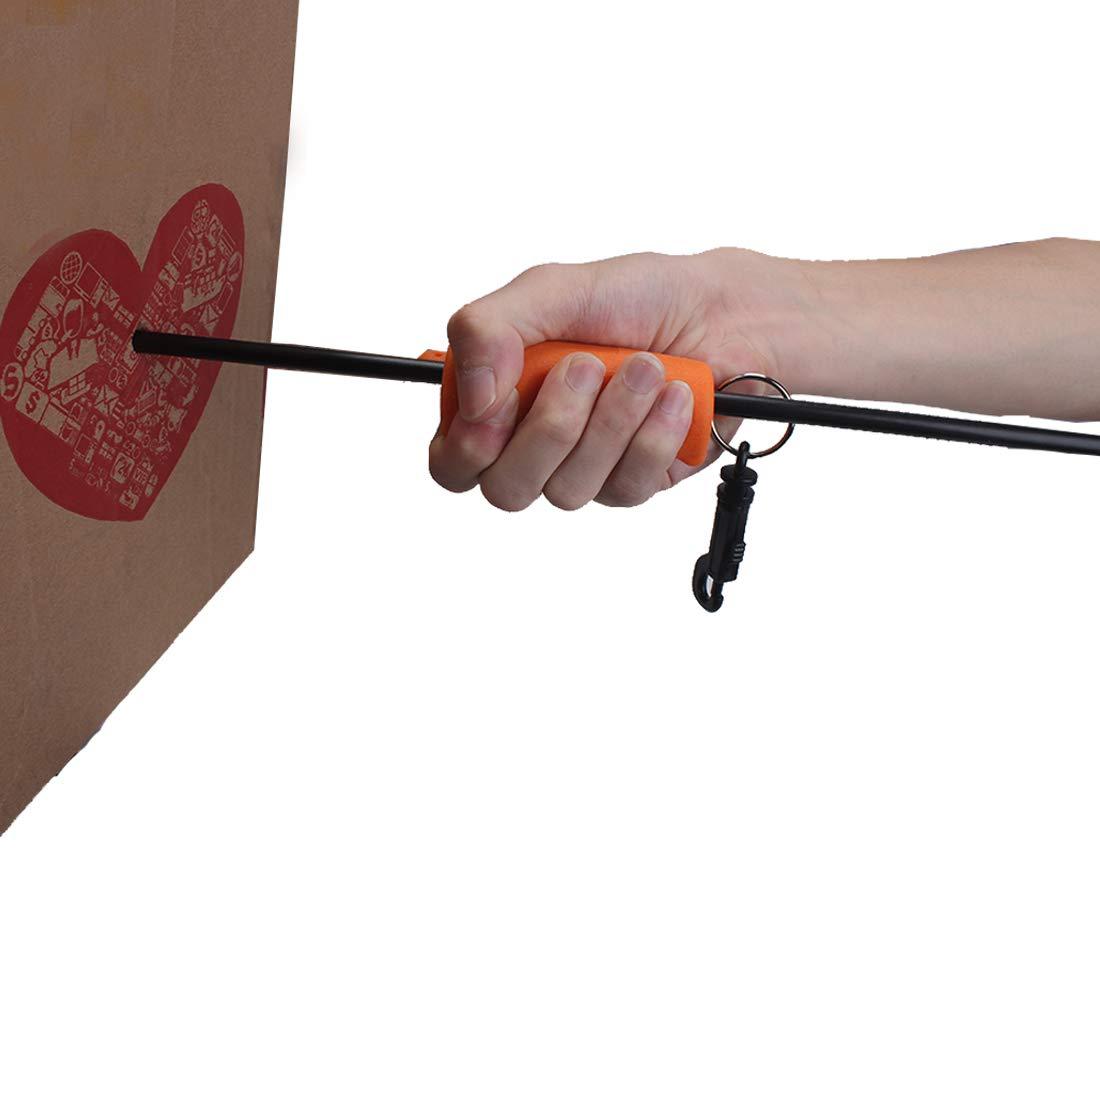 KRATARC Archery Arrow Puller Target Remover Rubber Gripper with Belt Clip